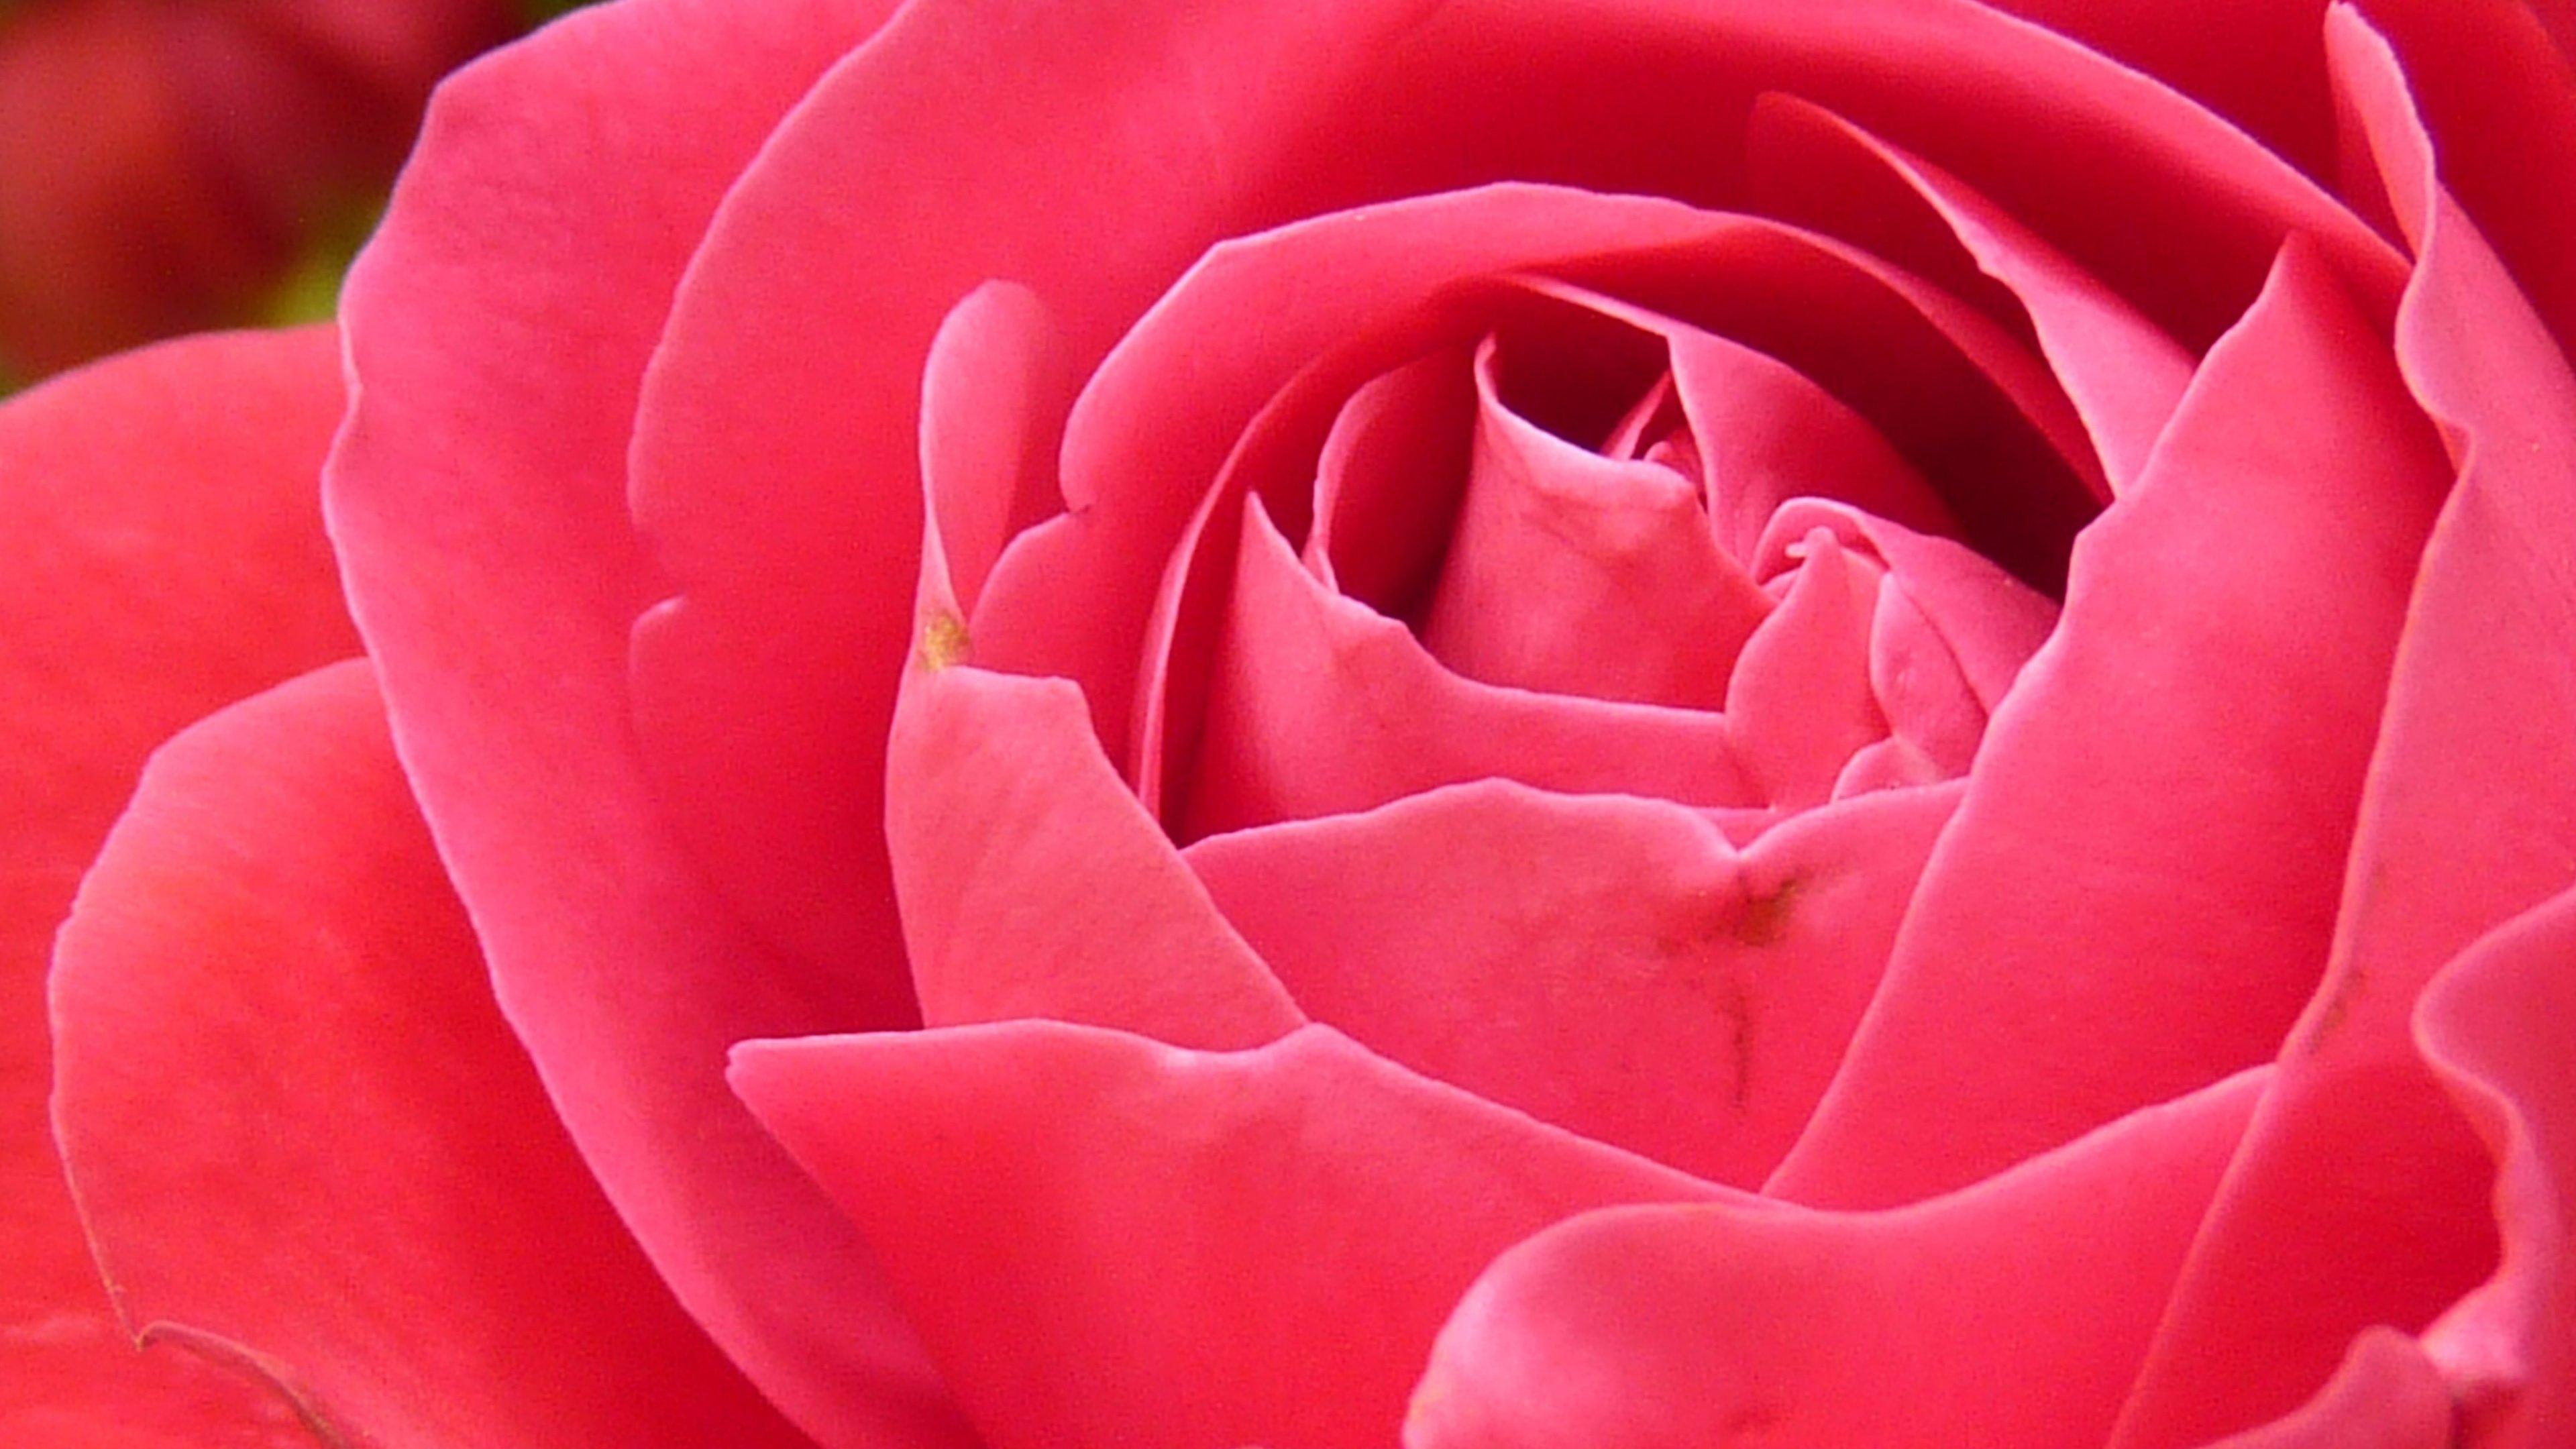 Bright Pink Rose Closeup Wallpaper